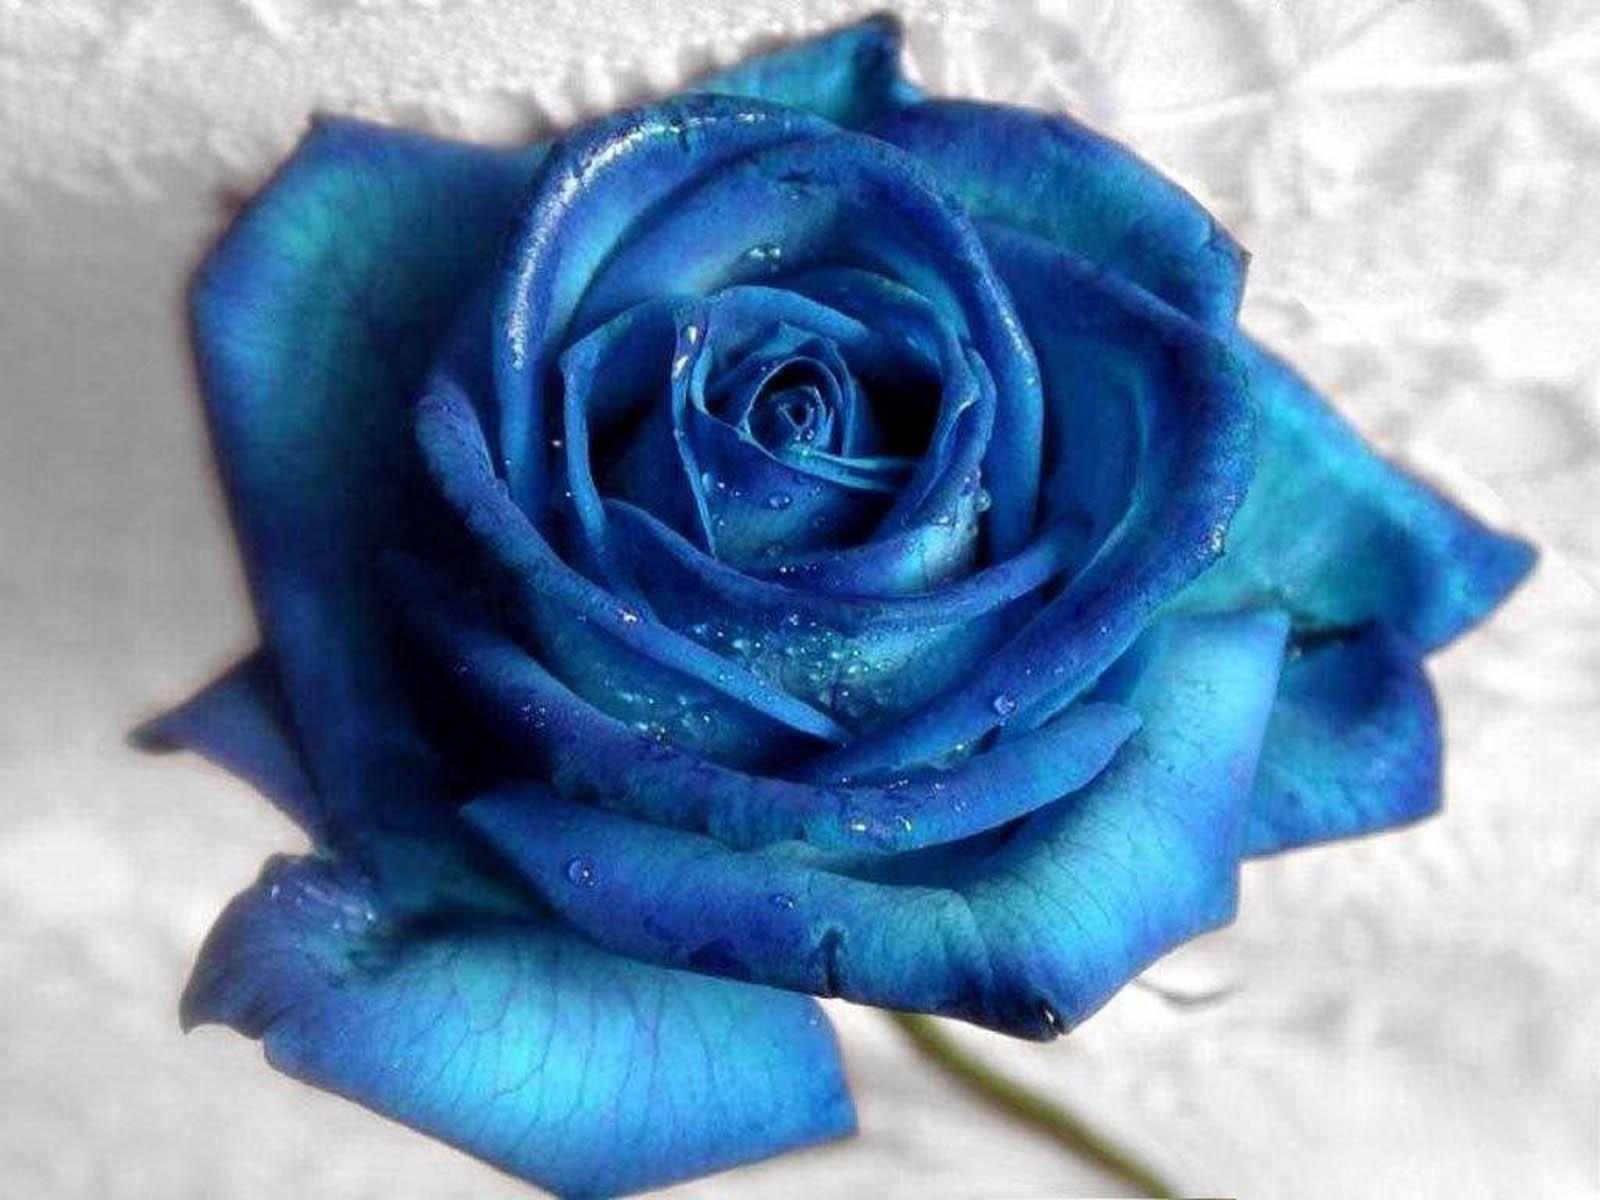 http://2.bp.blogspot.com/-u1VAhTy4O58/UF6-Q6EVKiI/AAAAAAAAKU0/OzJLycOURd4/s1600/Blue%2BRose%2BWallpapers%2B2.jpg